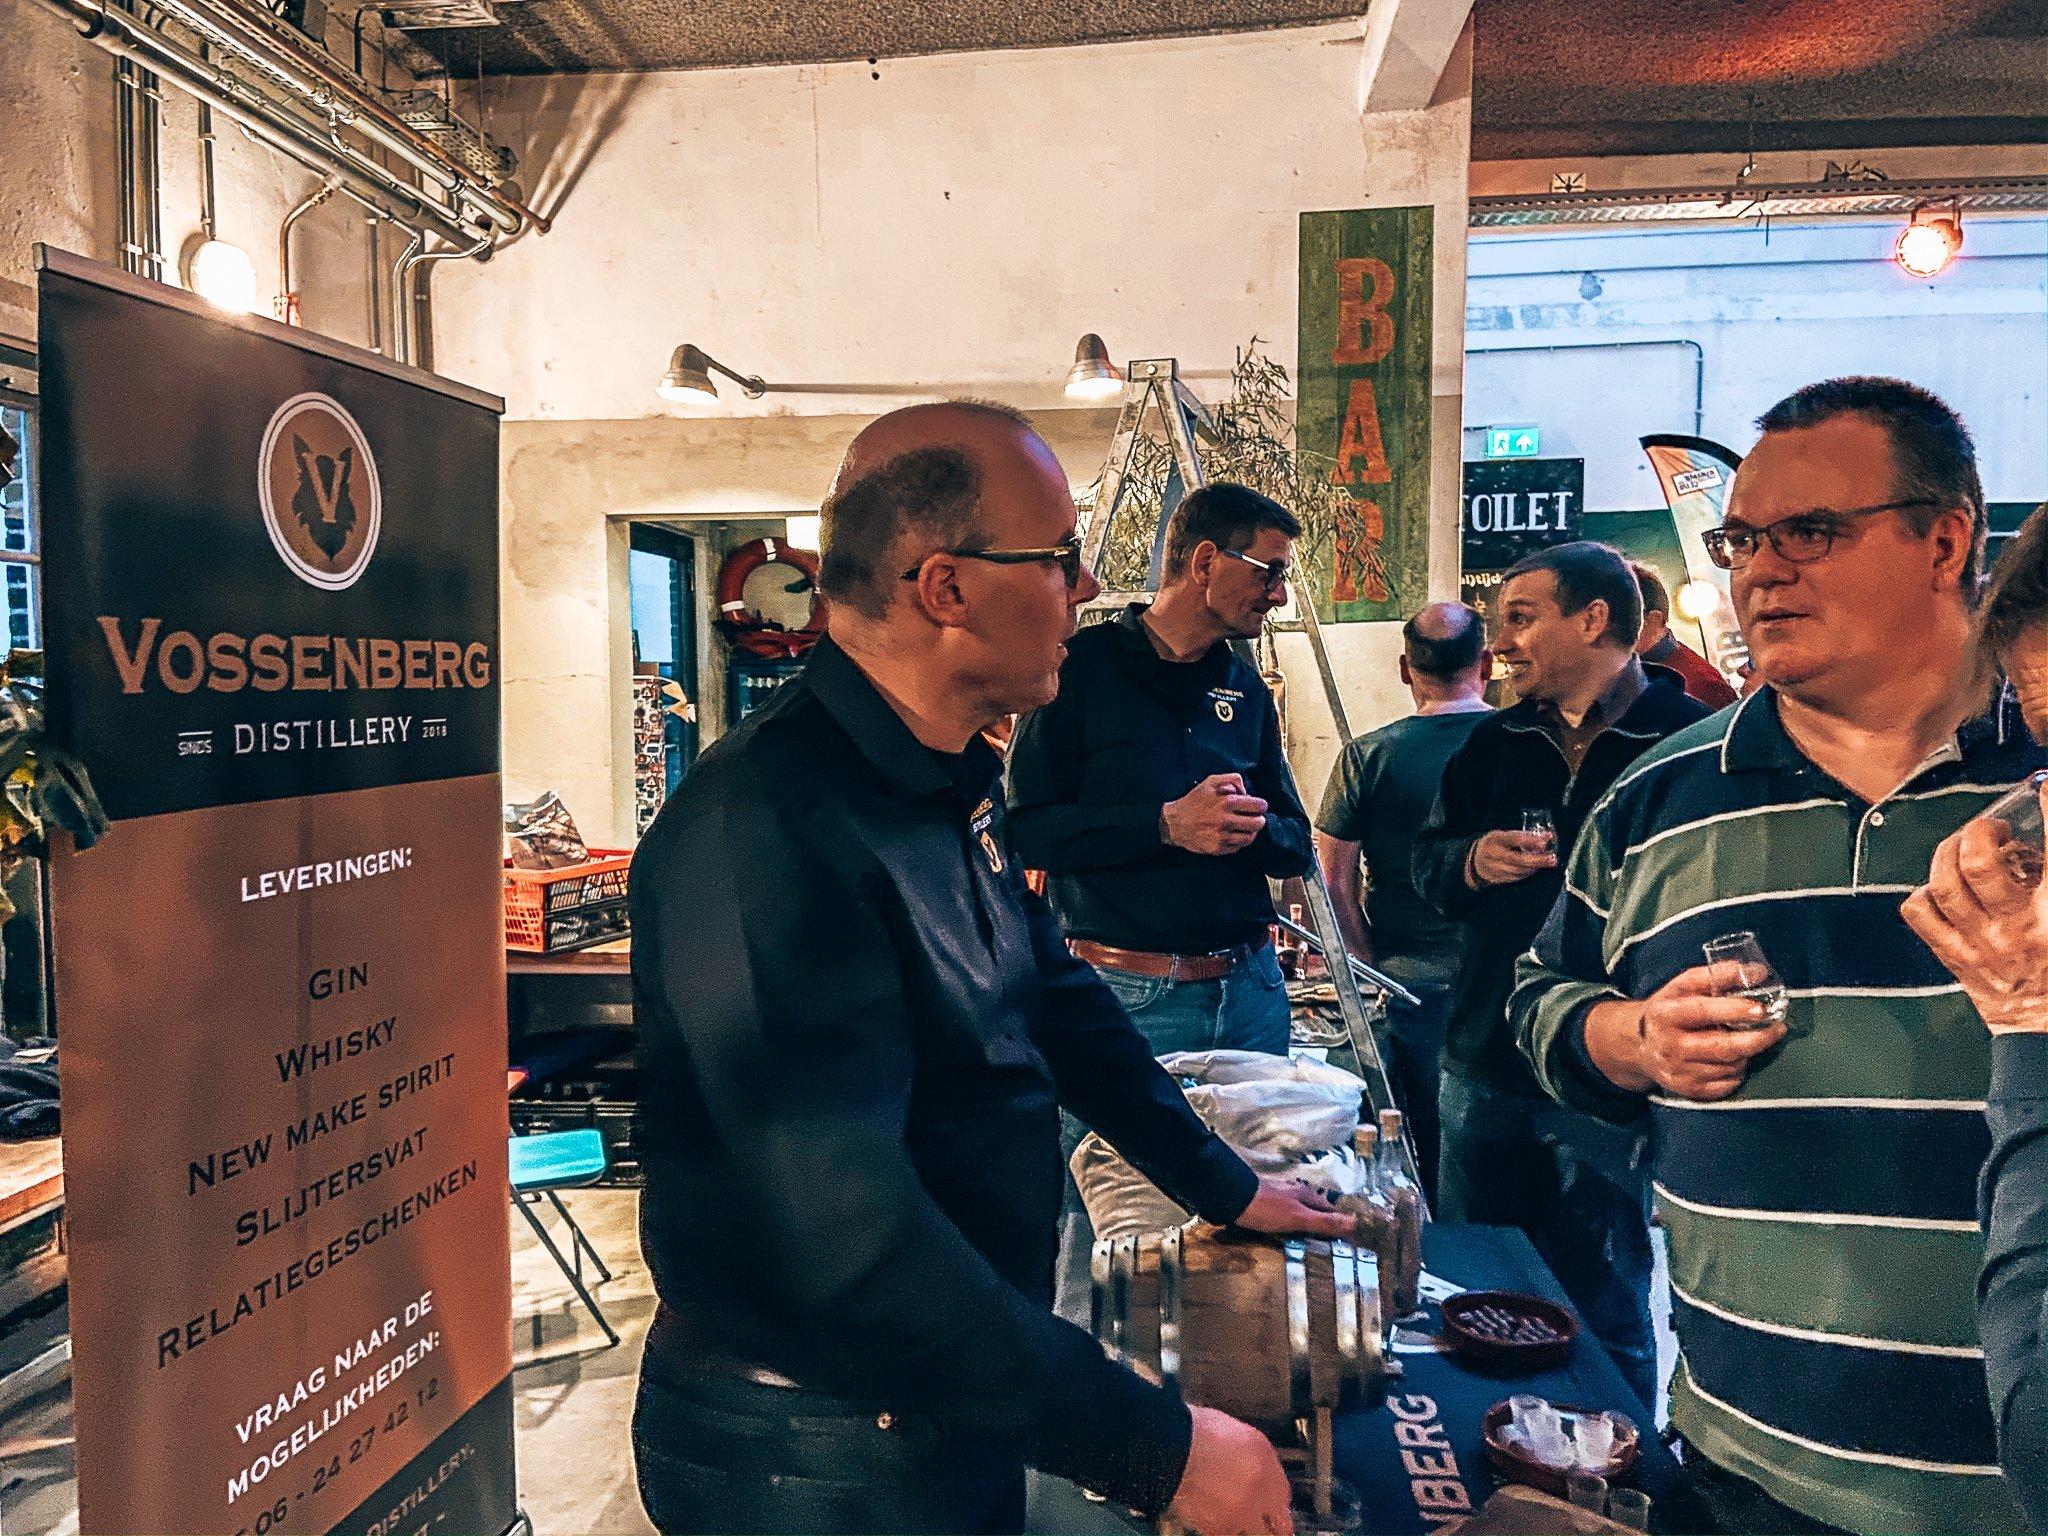 Vossenberg Distillery, Binnenlands Gedistilleerd, Fooddock Deventer, Alles over gin.